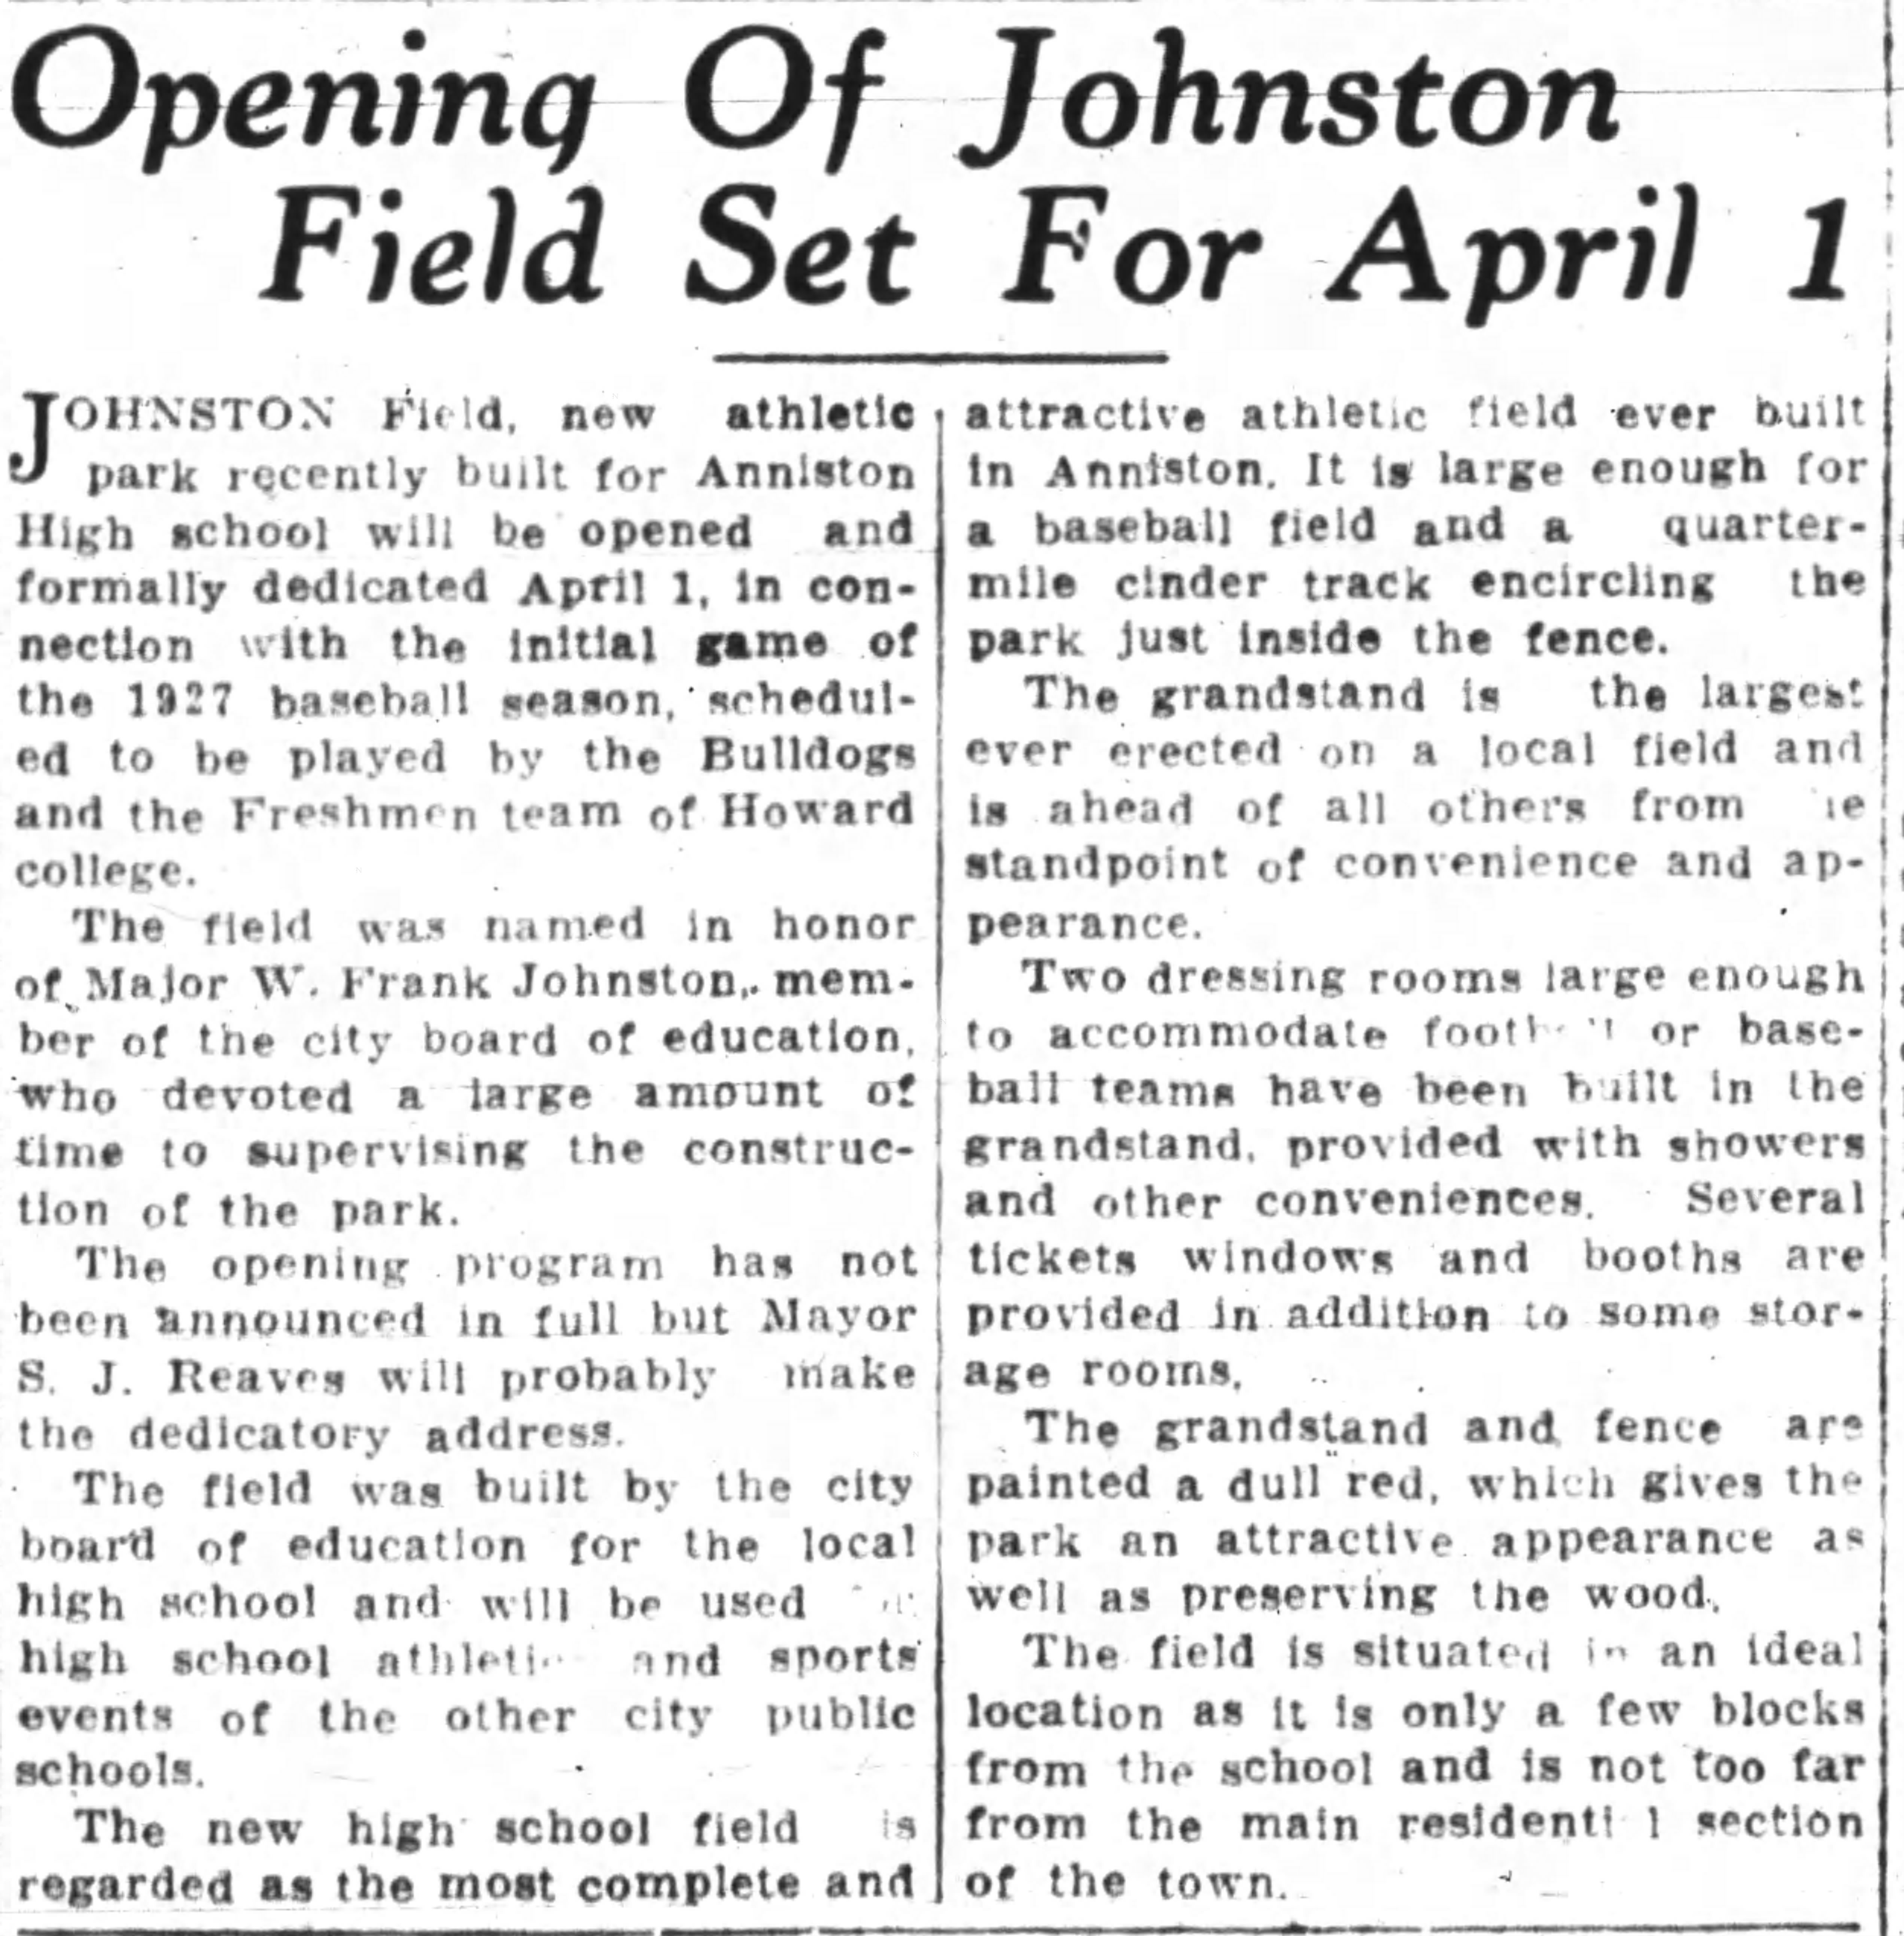 The_Anniston_Star_Sun__Mar_13__1927_